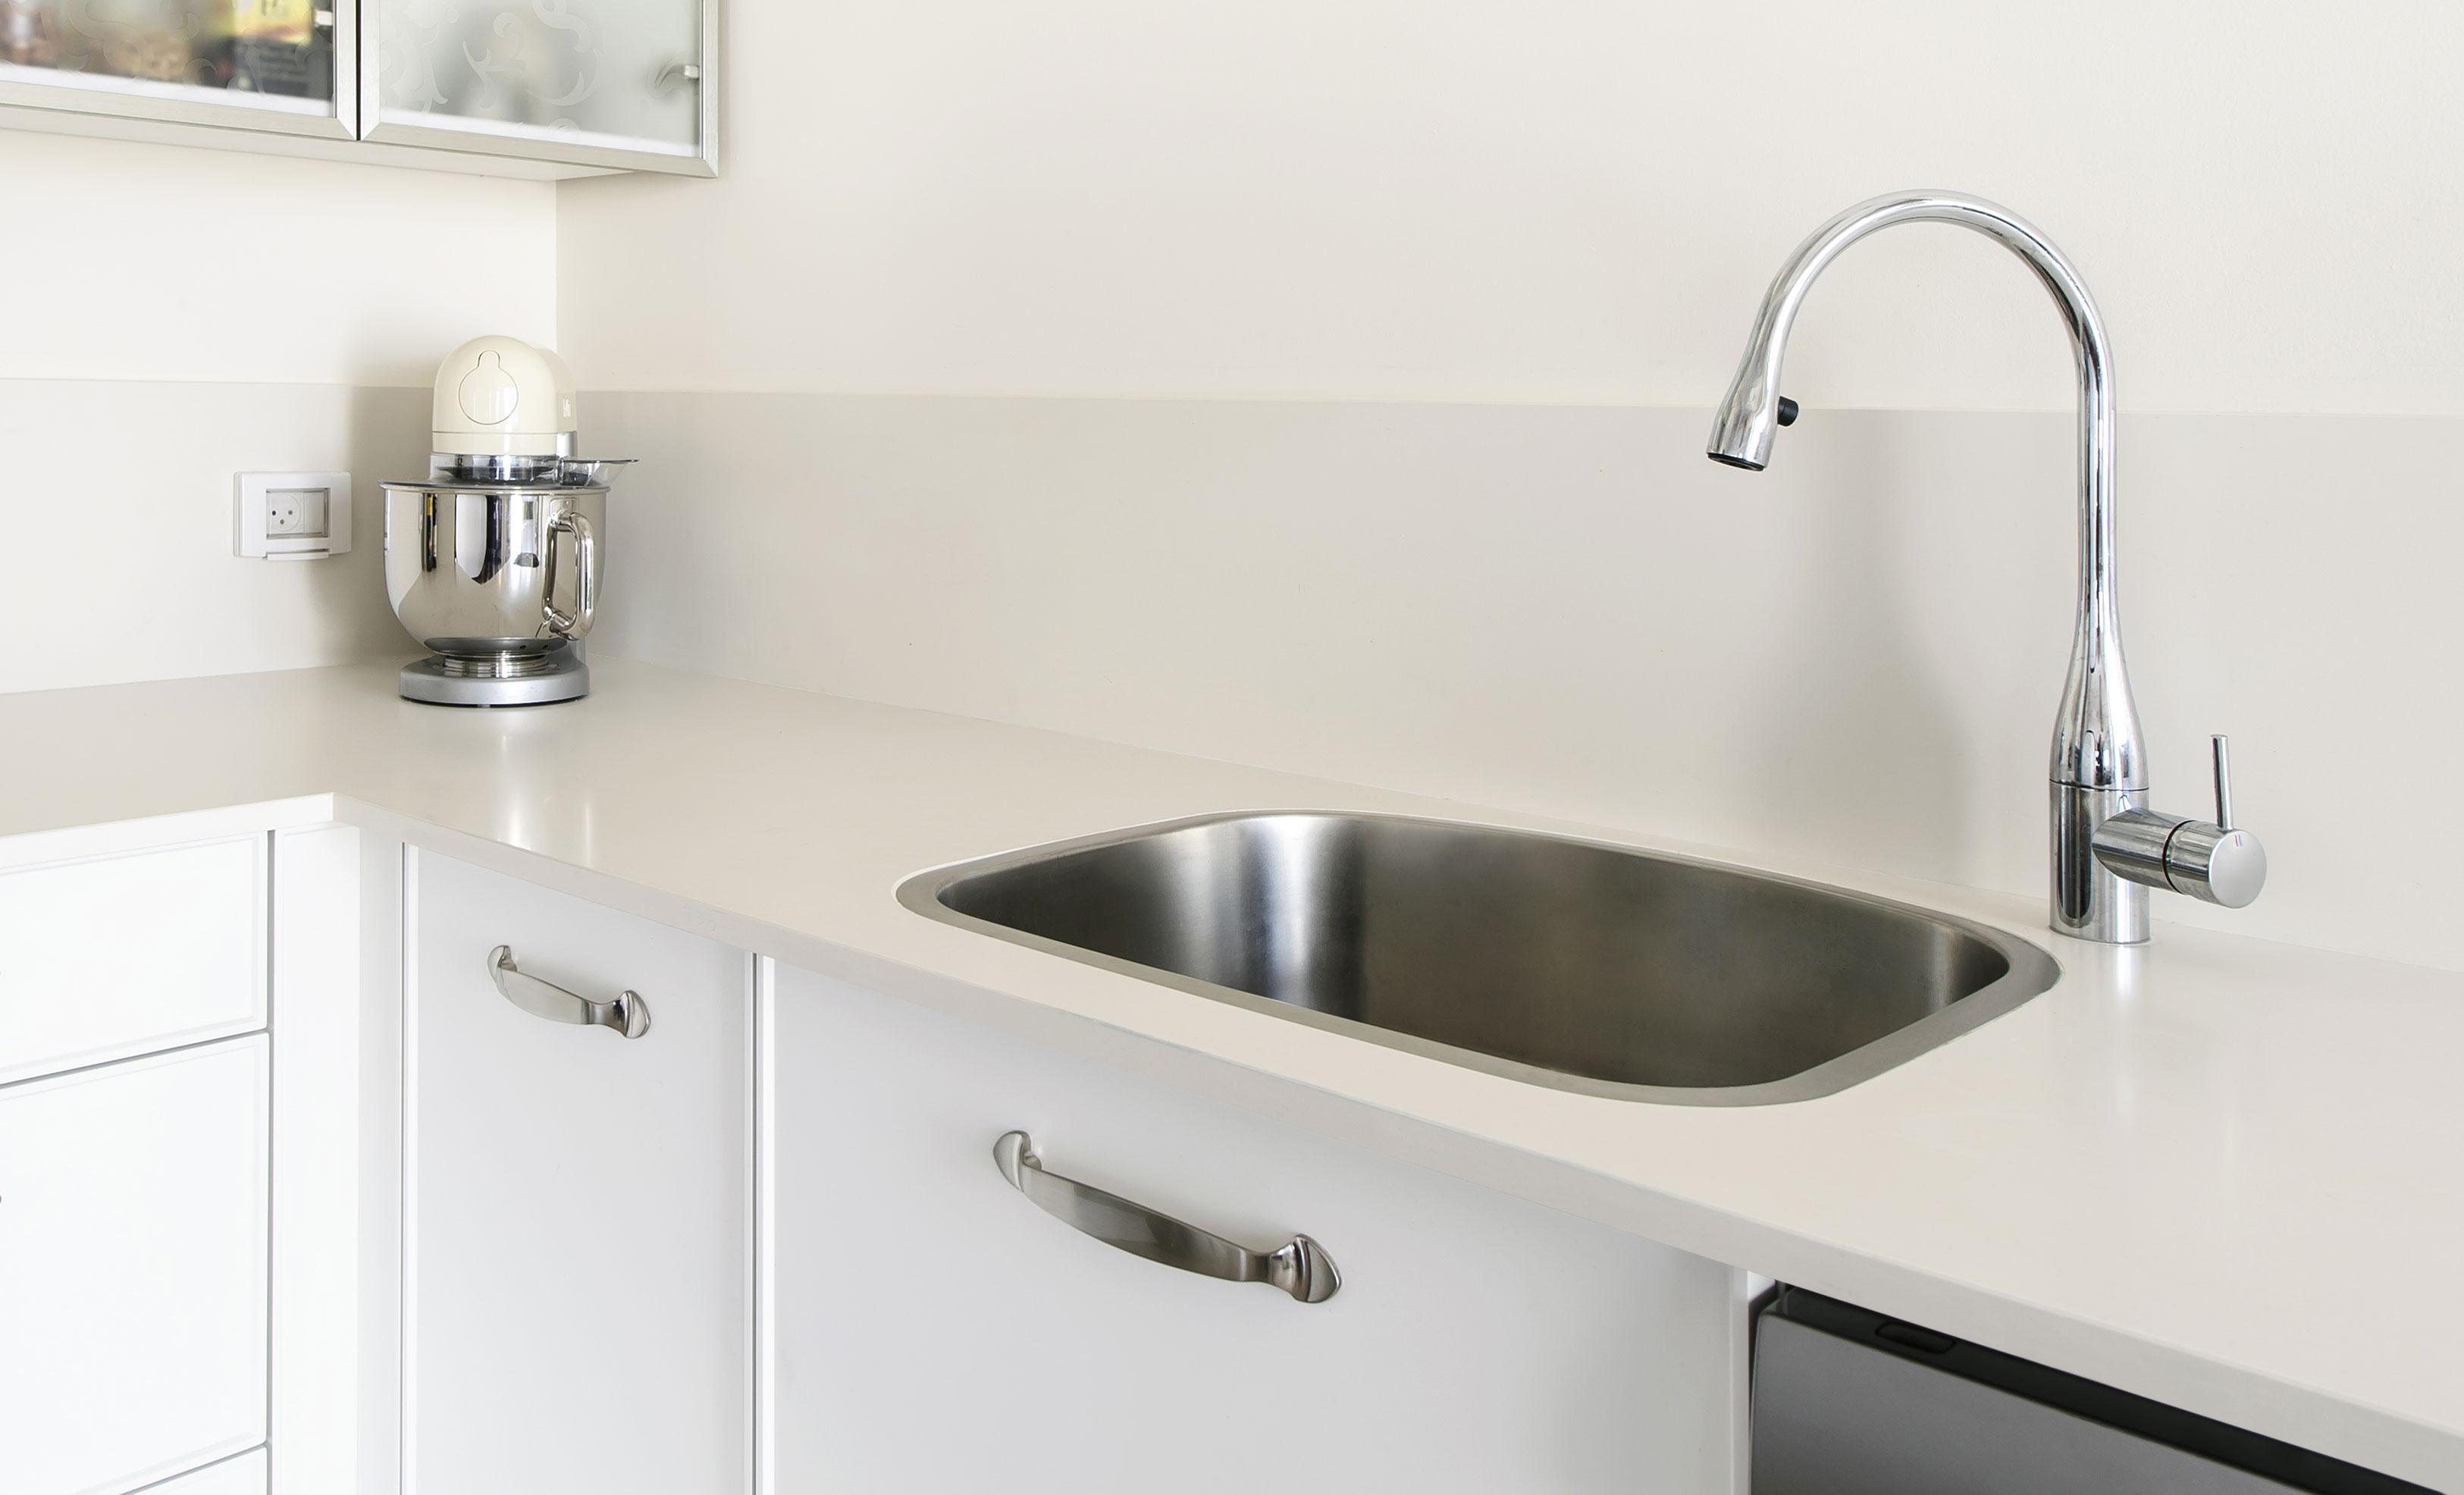 Lapitec Sintered Stone Kitchen Countertop in Bianco Crema (White)